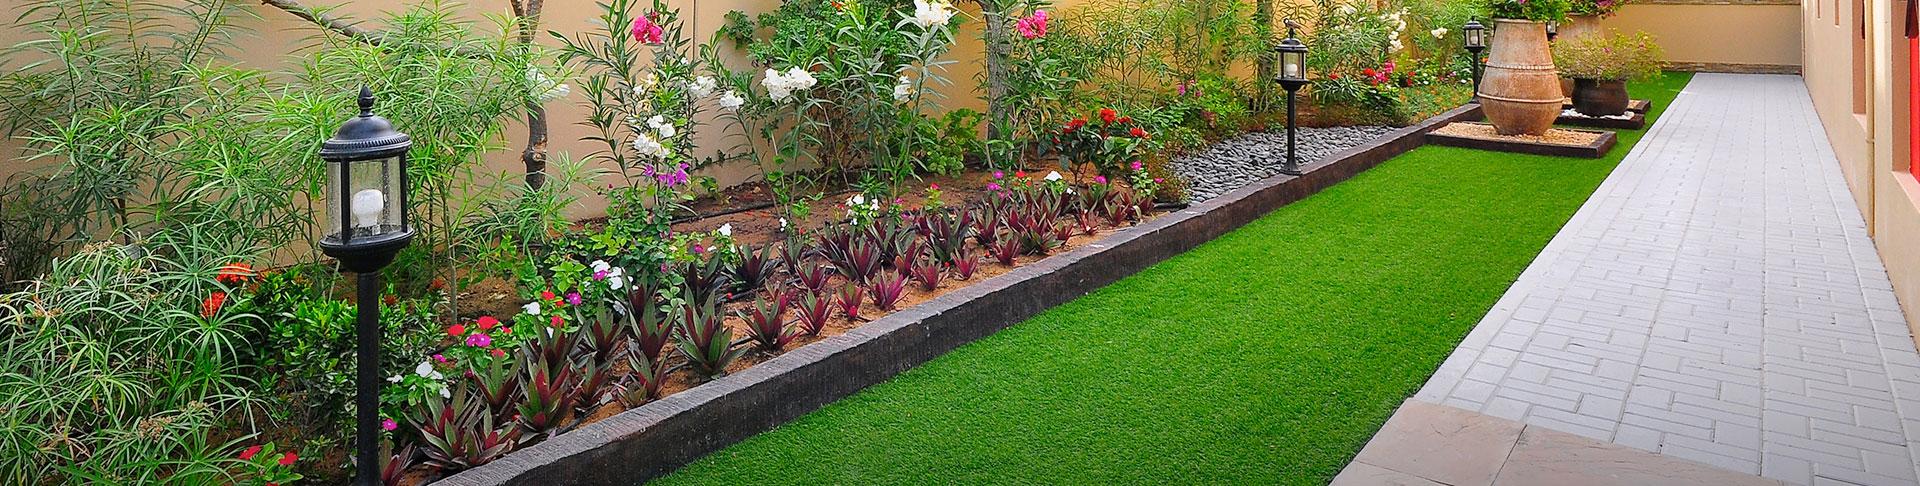 LandscapingMain-GardenDesign